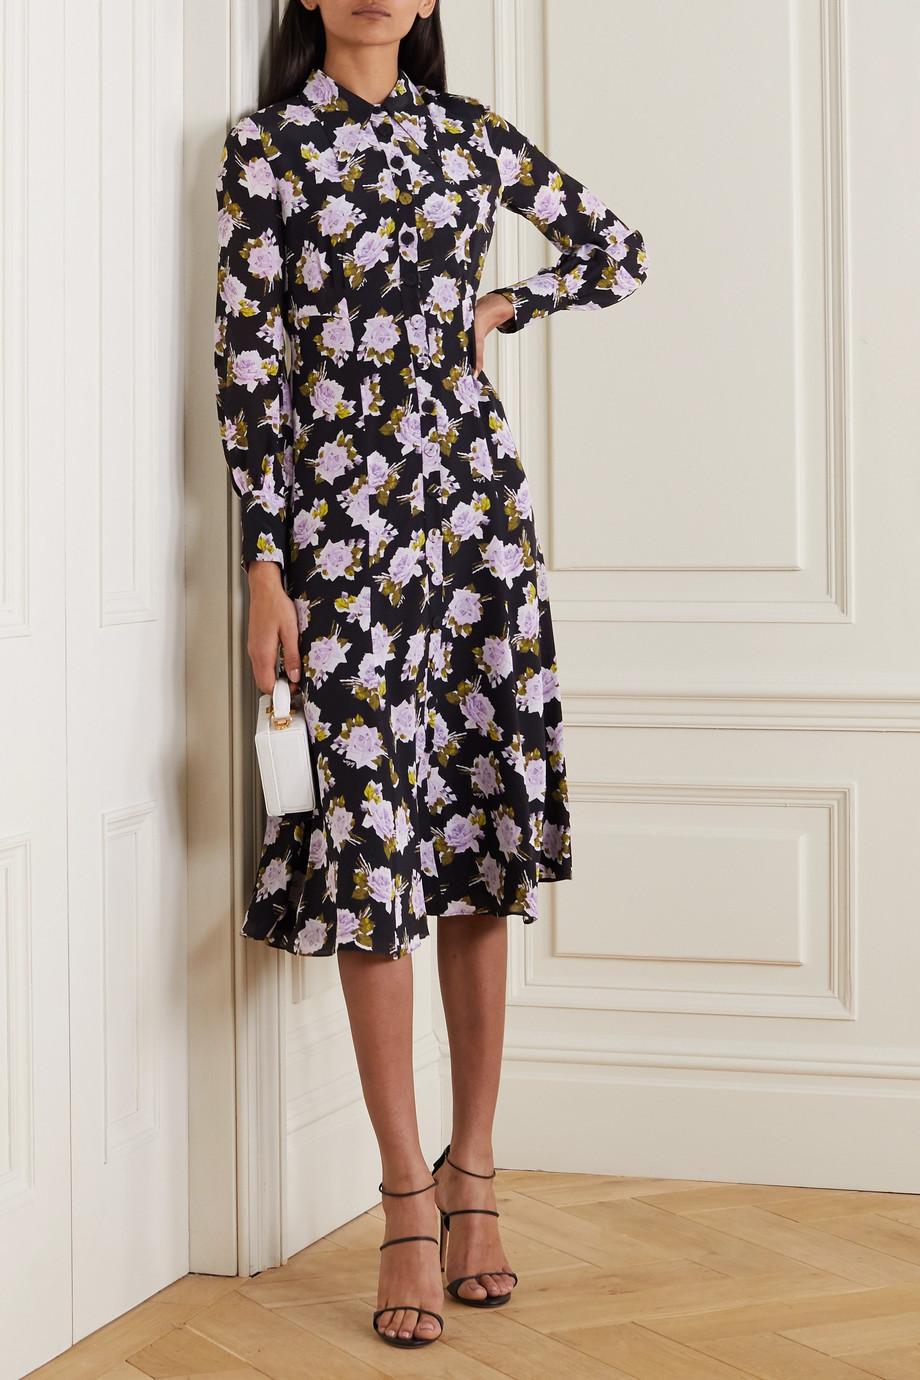 Erdem Penley Midi-Hemdblusenkleid aus Seiden-Crêpe mit Blumenprint